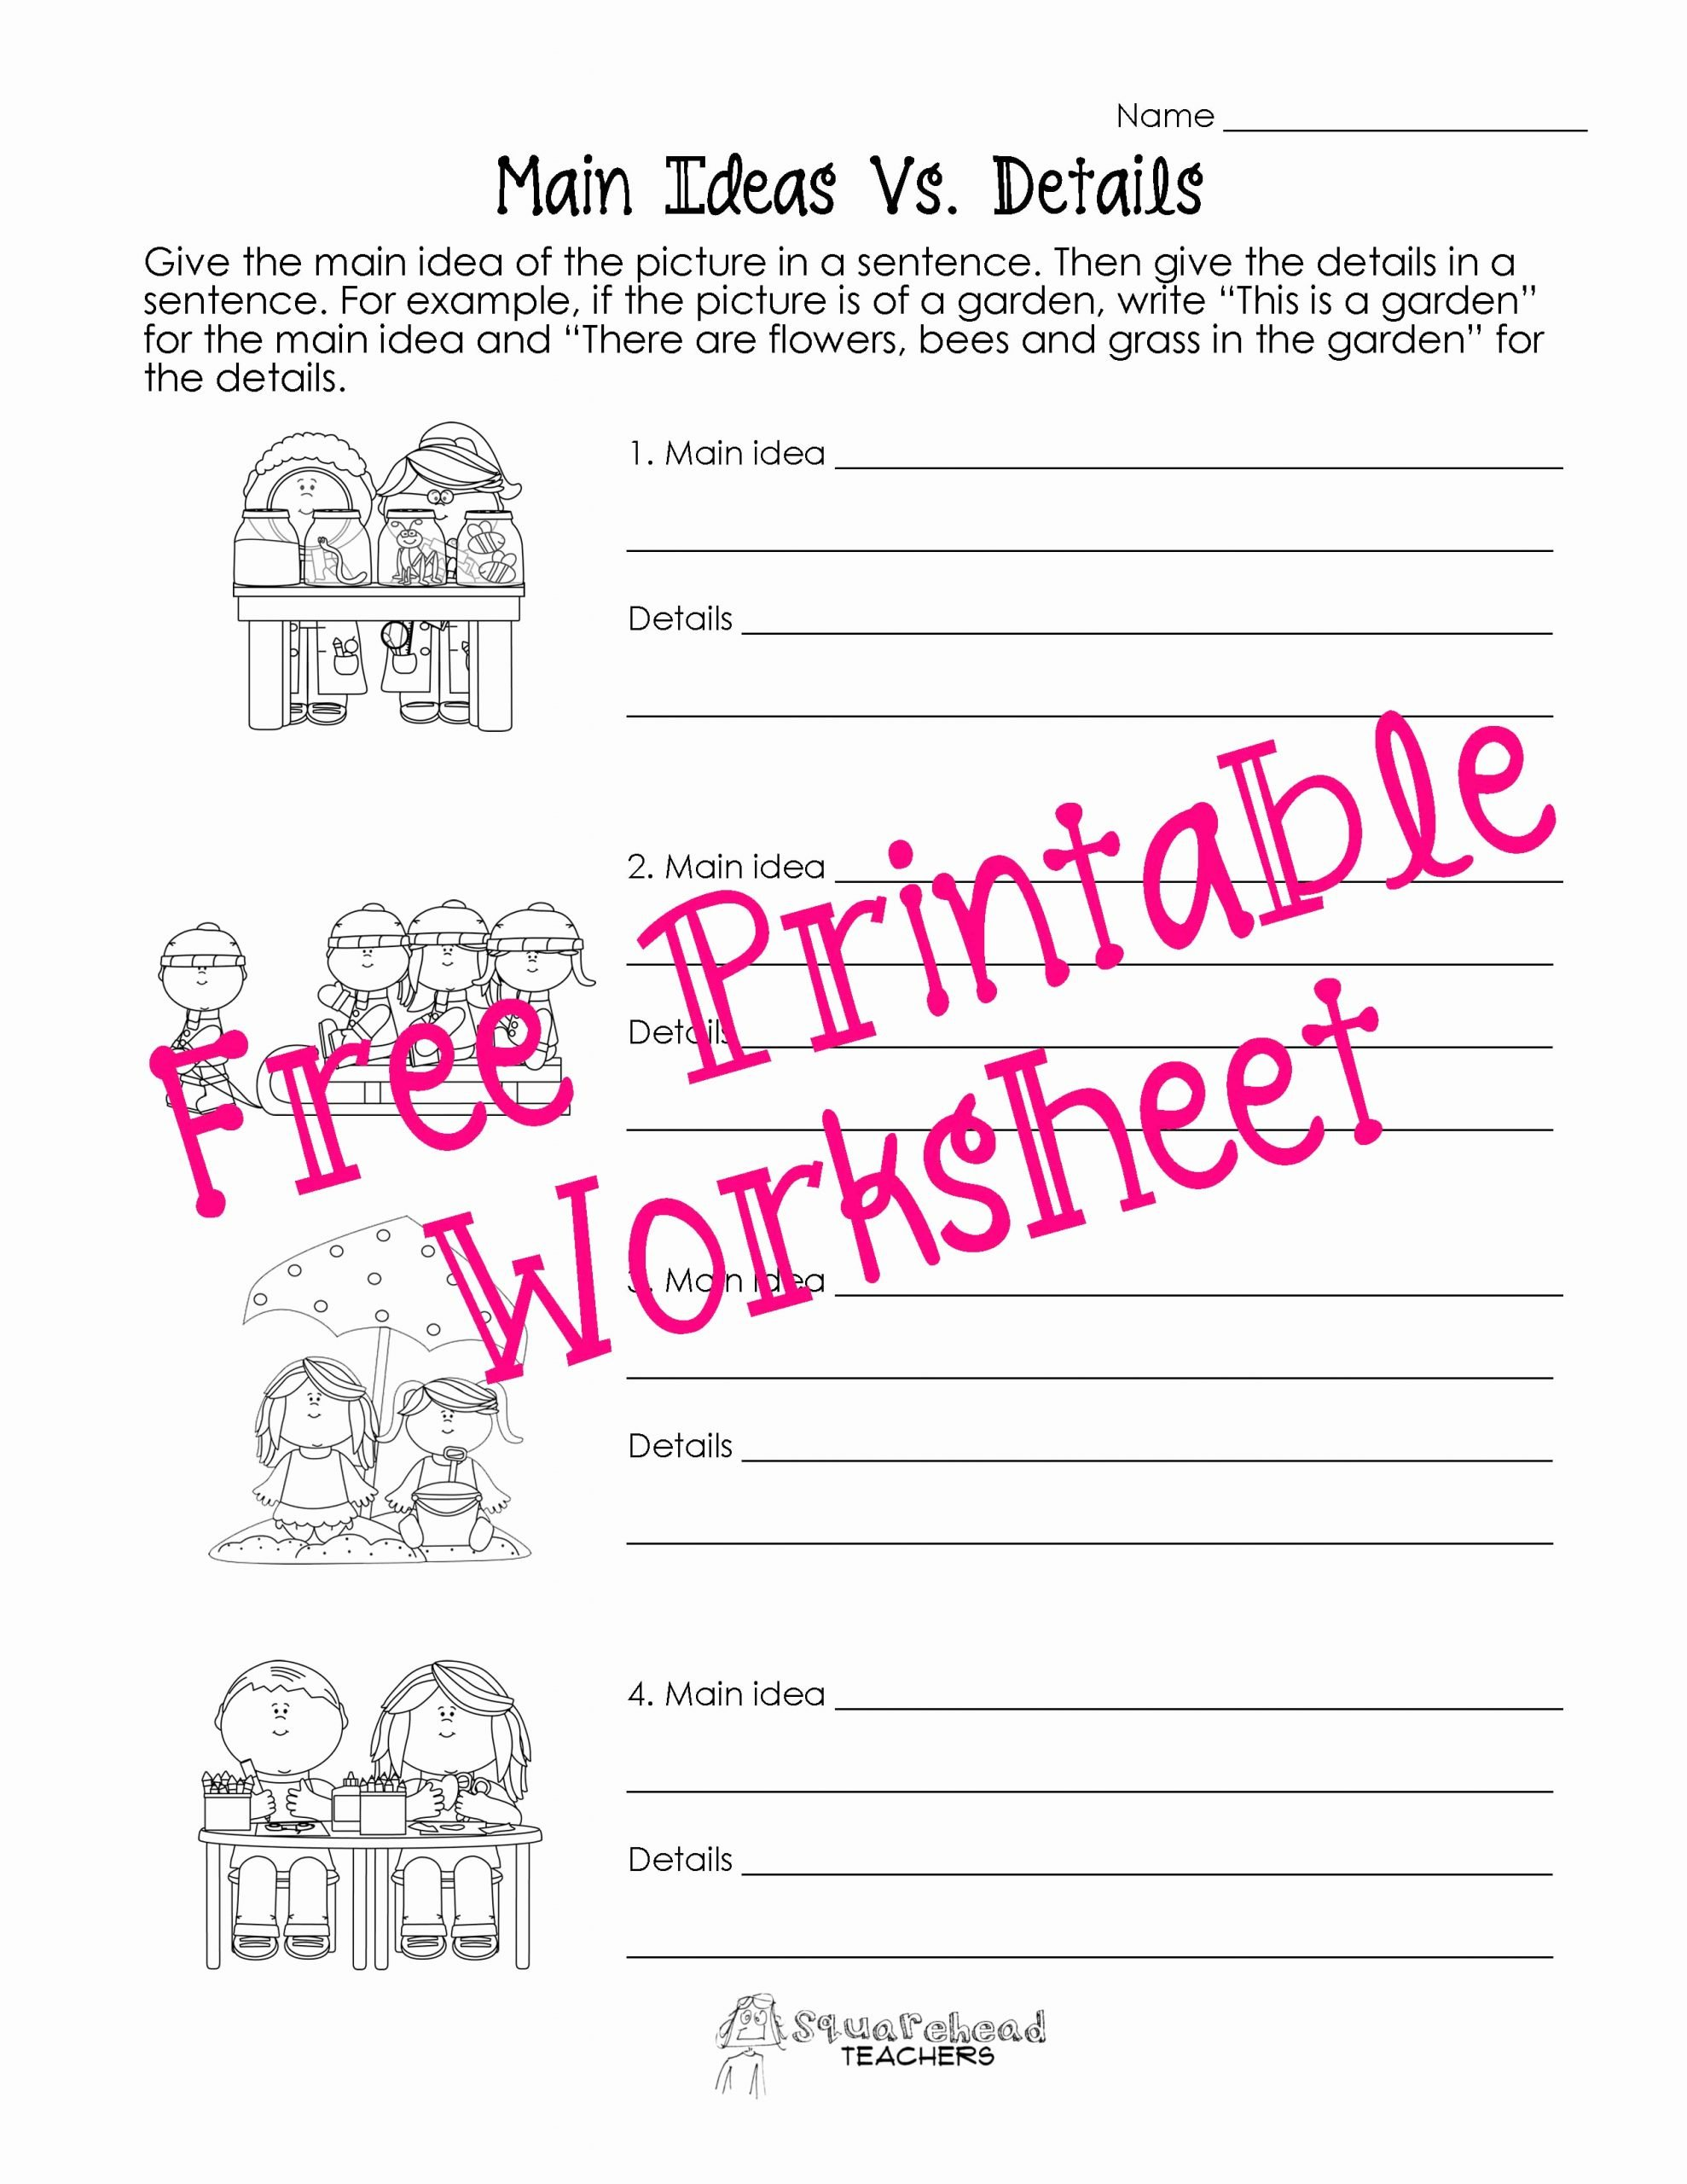 Main Idea First Grade Worksheets Lovely Main Idea Vs Details Worksheets